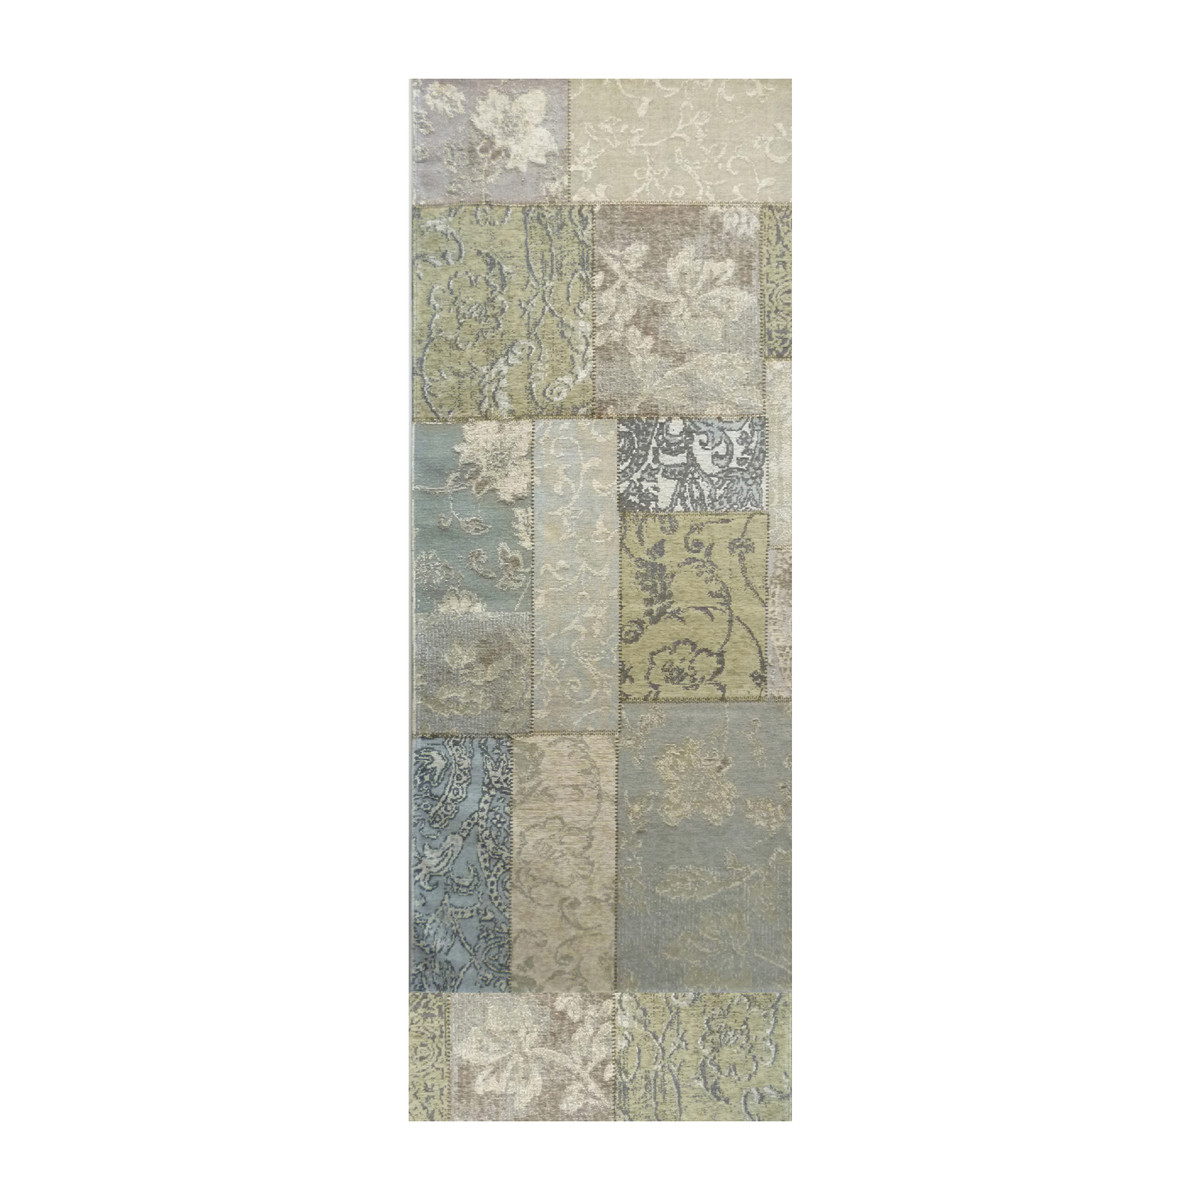 Webmarketpoint tappeto moderno 200 x 300 rosso prezzo e - Tappeto viola leroy merlin ...